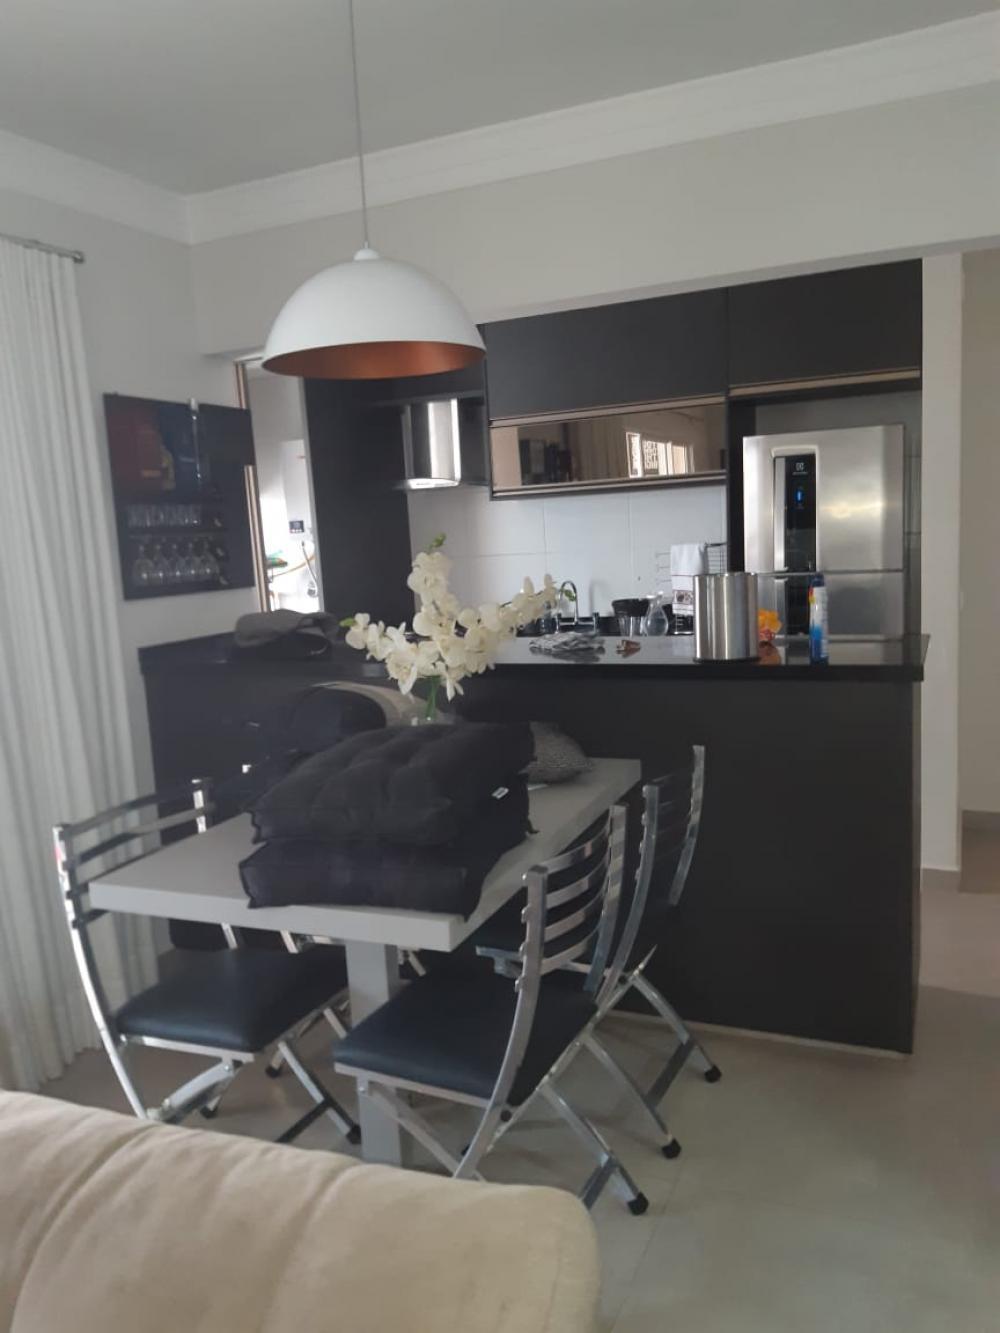 Sao Jose do Rio Preto Apartamento Venda R$800.000,00 Condominio R$480,00 2 Dormitorios 2 Vagas Area construida 110.00m2